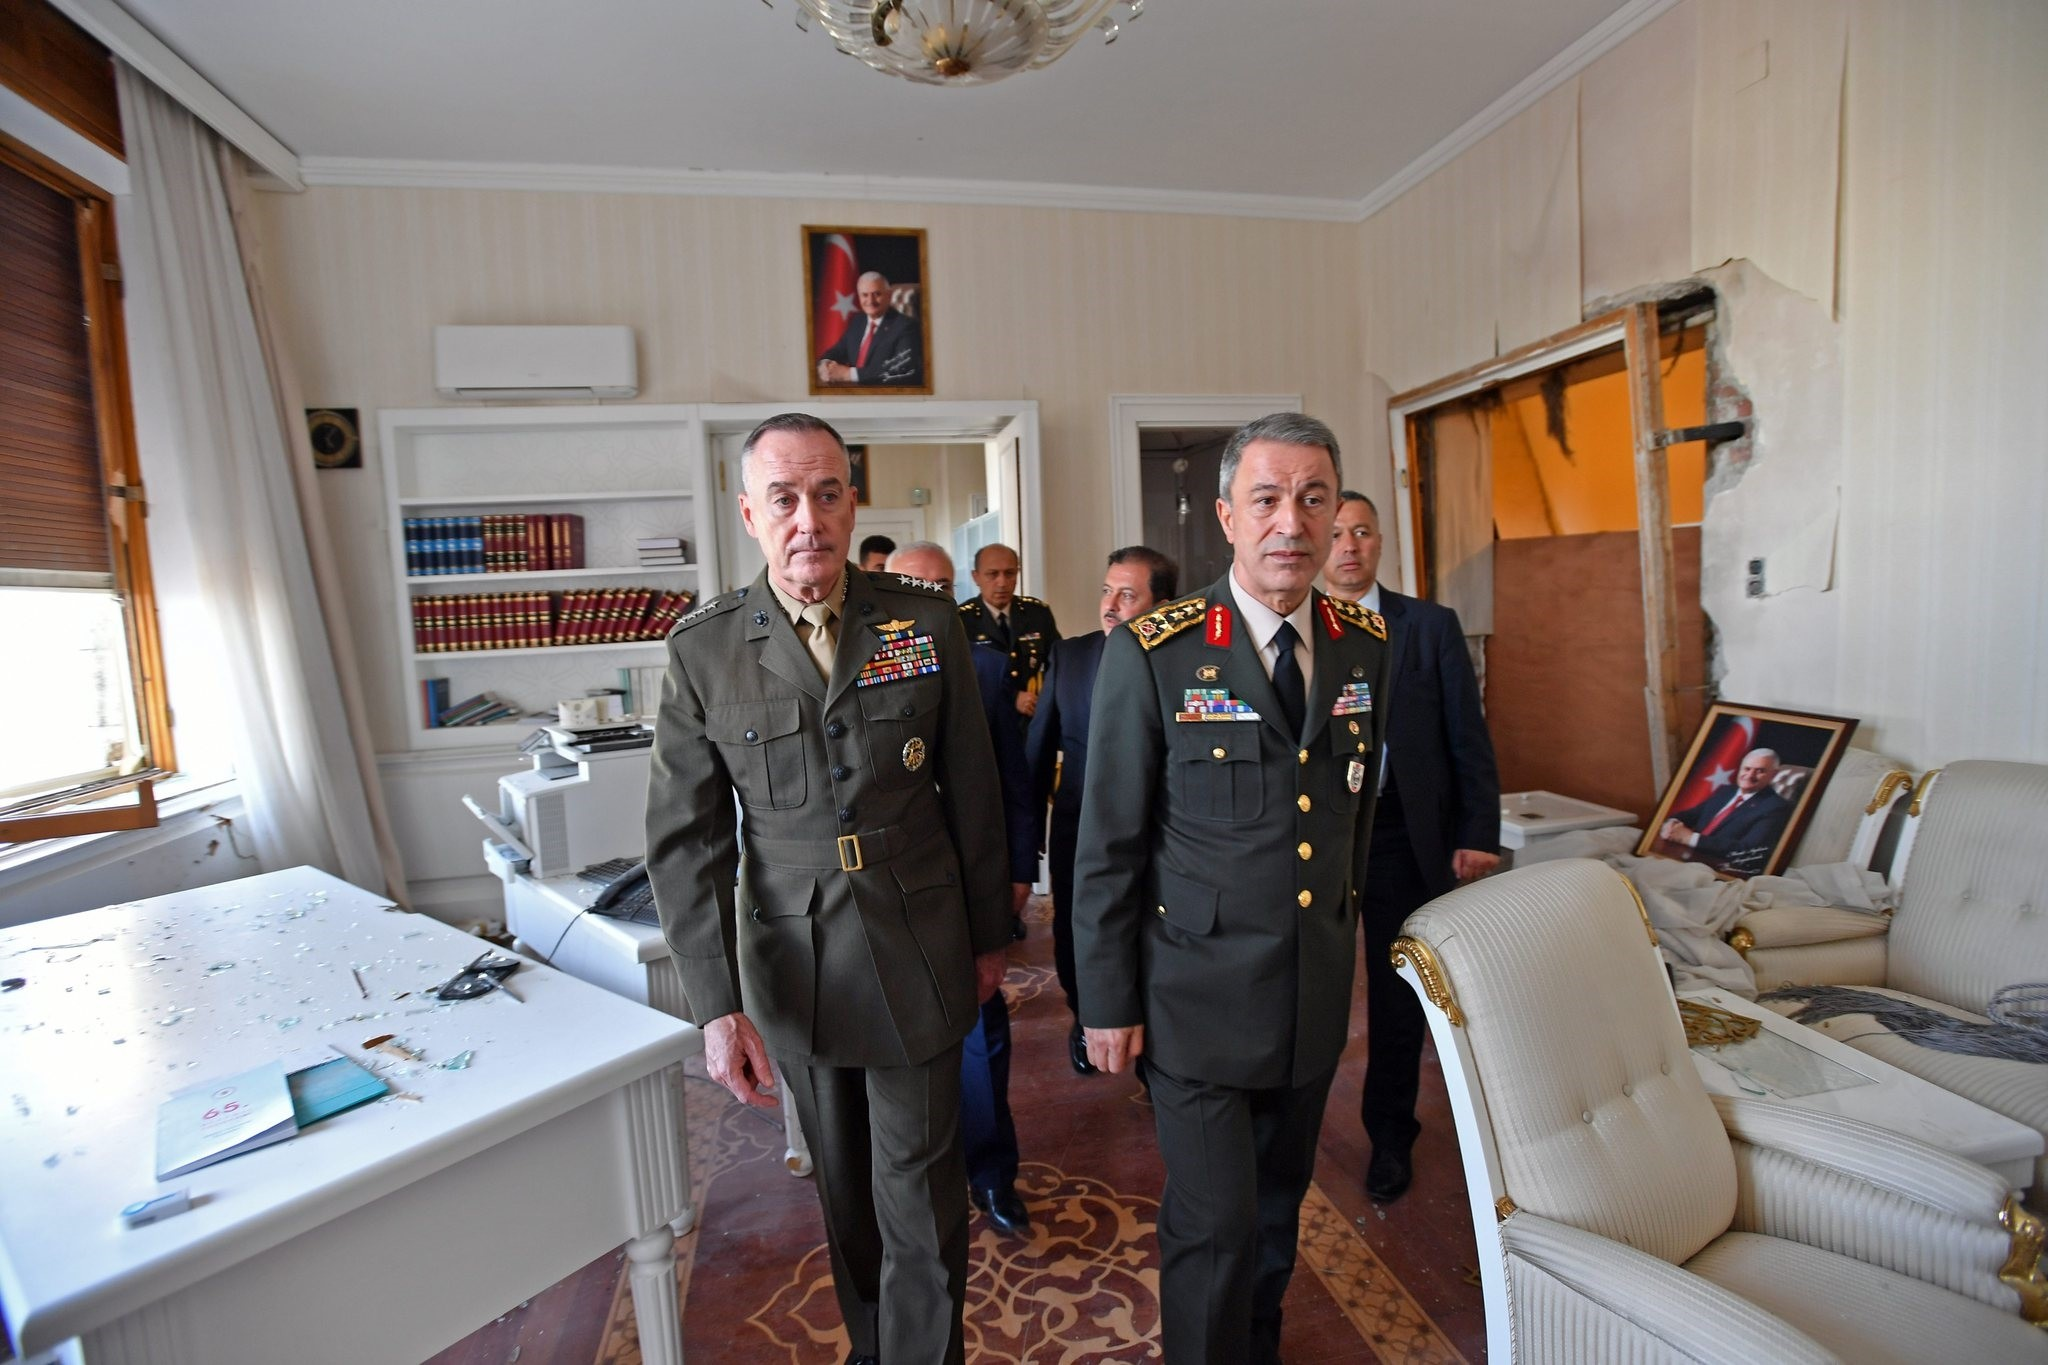 Turkeyu2019s Chief of General Staff Gen. Hulusi Akar and his U.S. counterpart Joseph Dunford at the Turkish Parliament in Ankara, Turkey. (AA Photo)